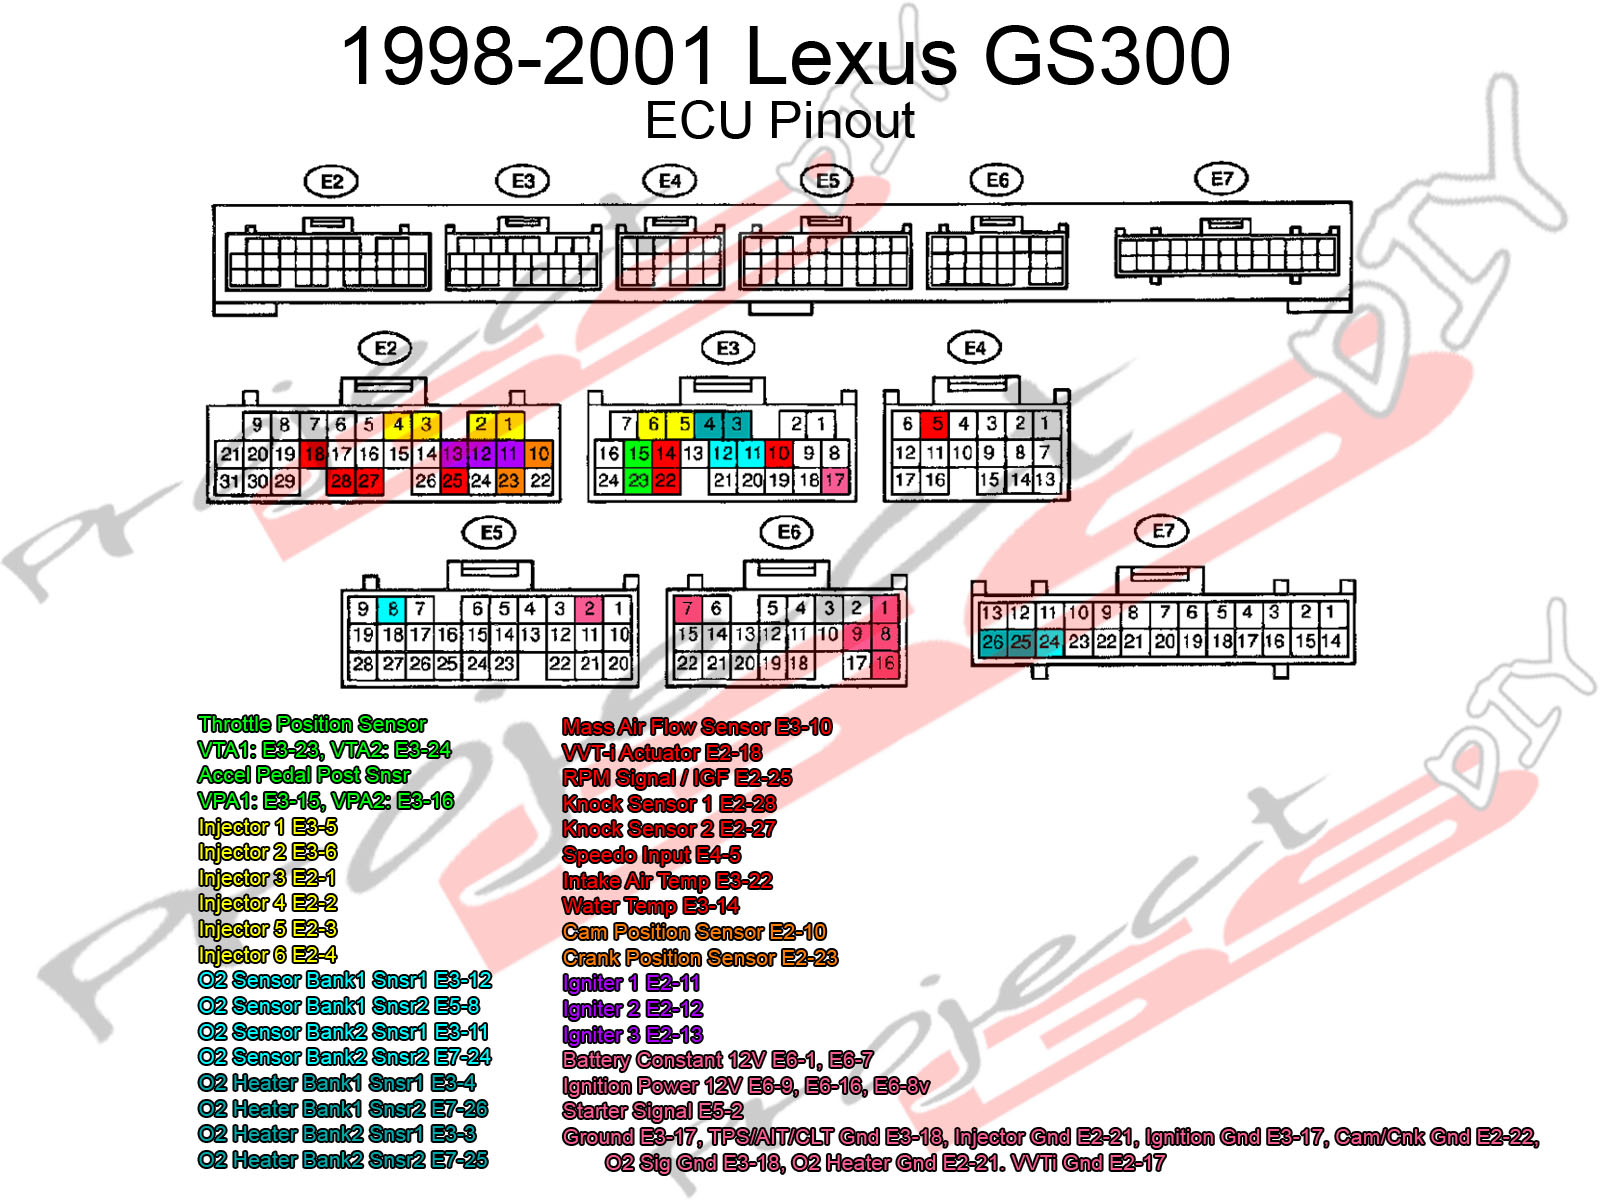 1996 Lexus Ls400 Fuse Box Lexus Gs300 1998 Be Rev Limiter Wiring Clublexus Lexus